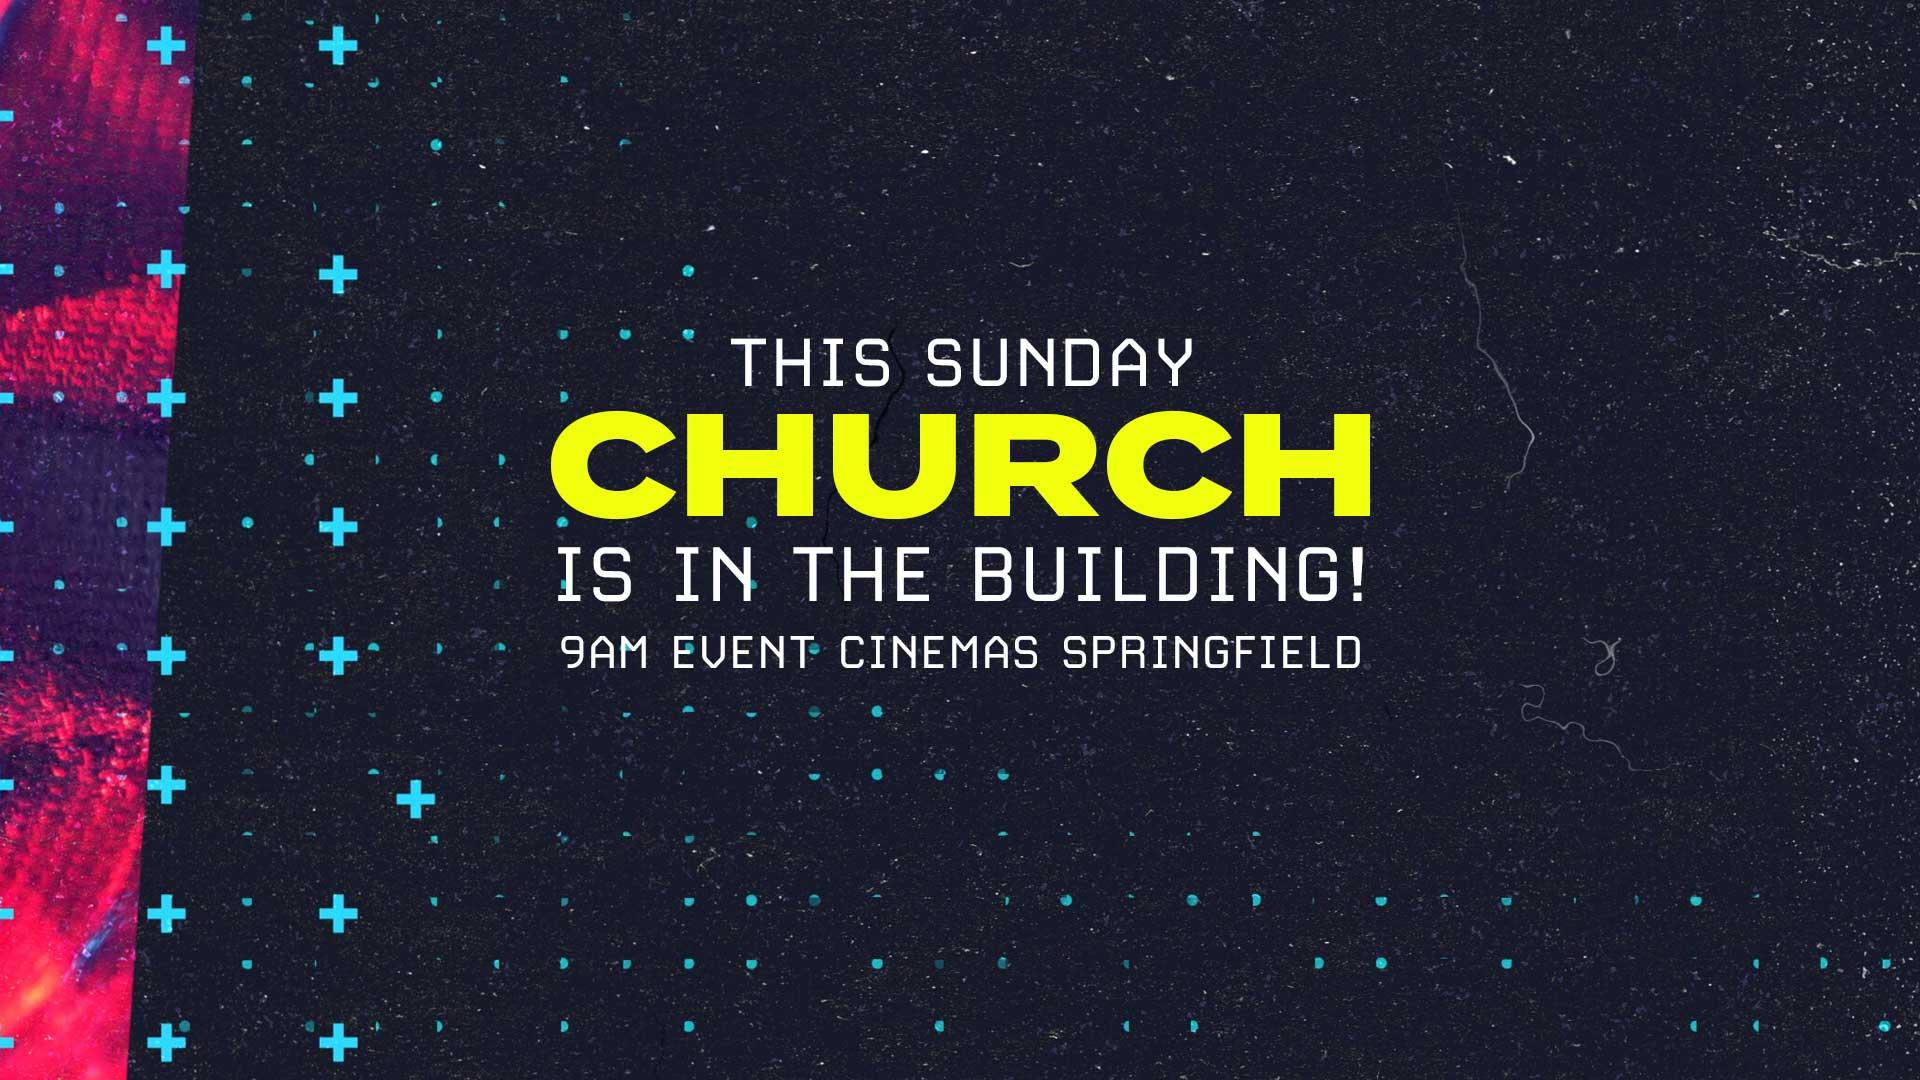 C3 Church Springfield covid